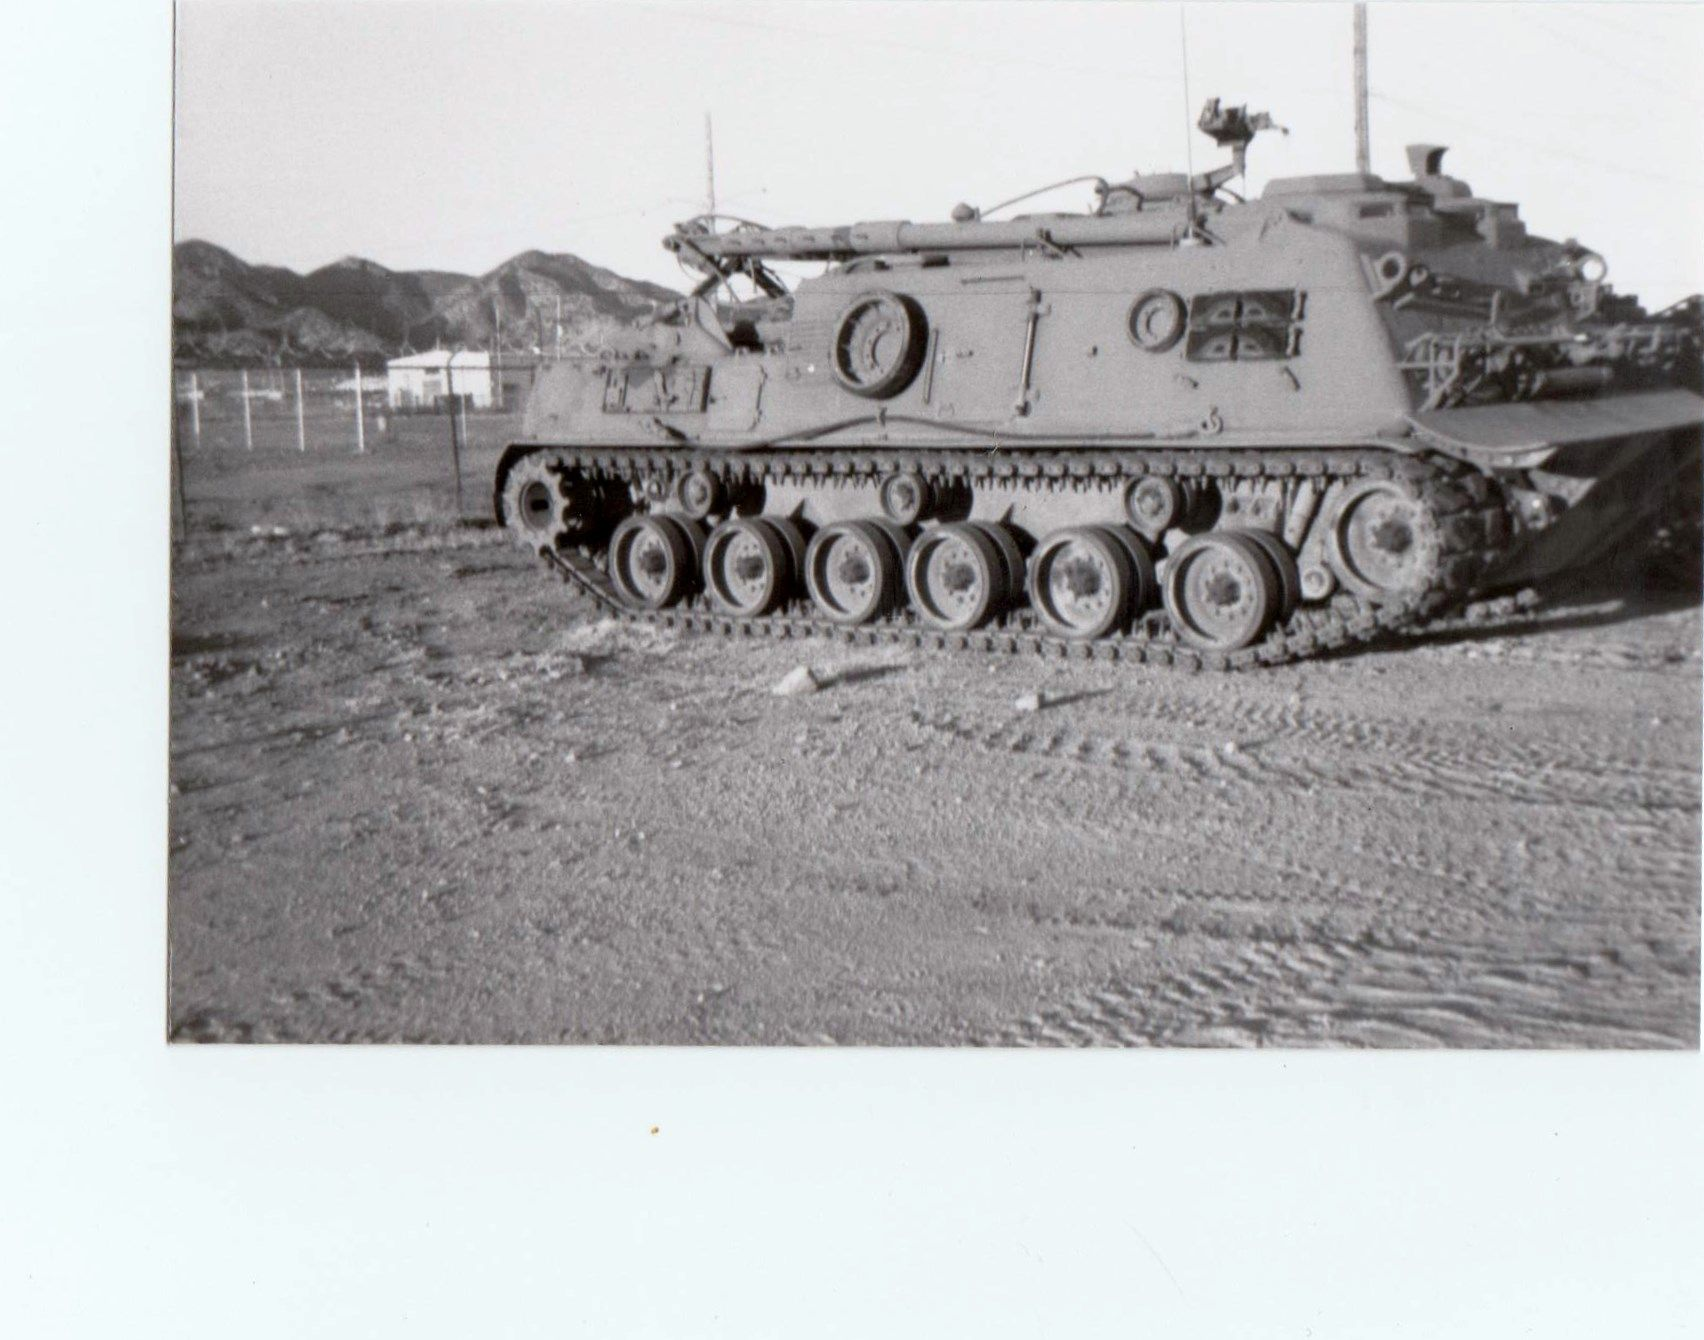 6135d620f093 M88 tank recovery vehicle. 8 40 ARBn Ft huachauca